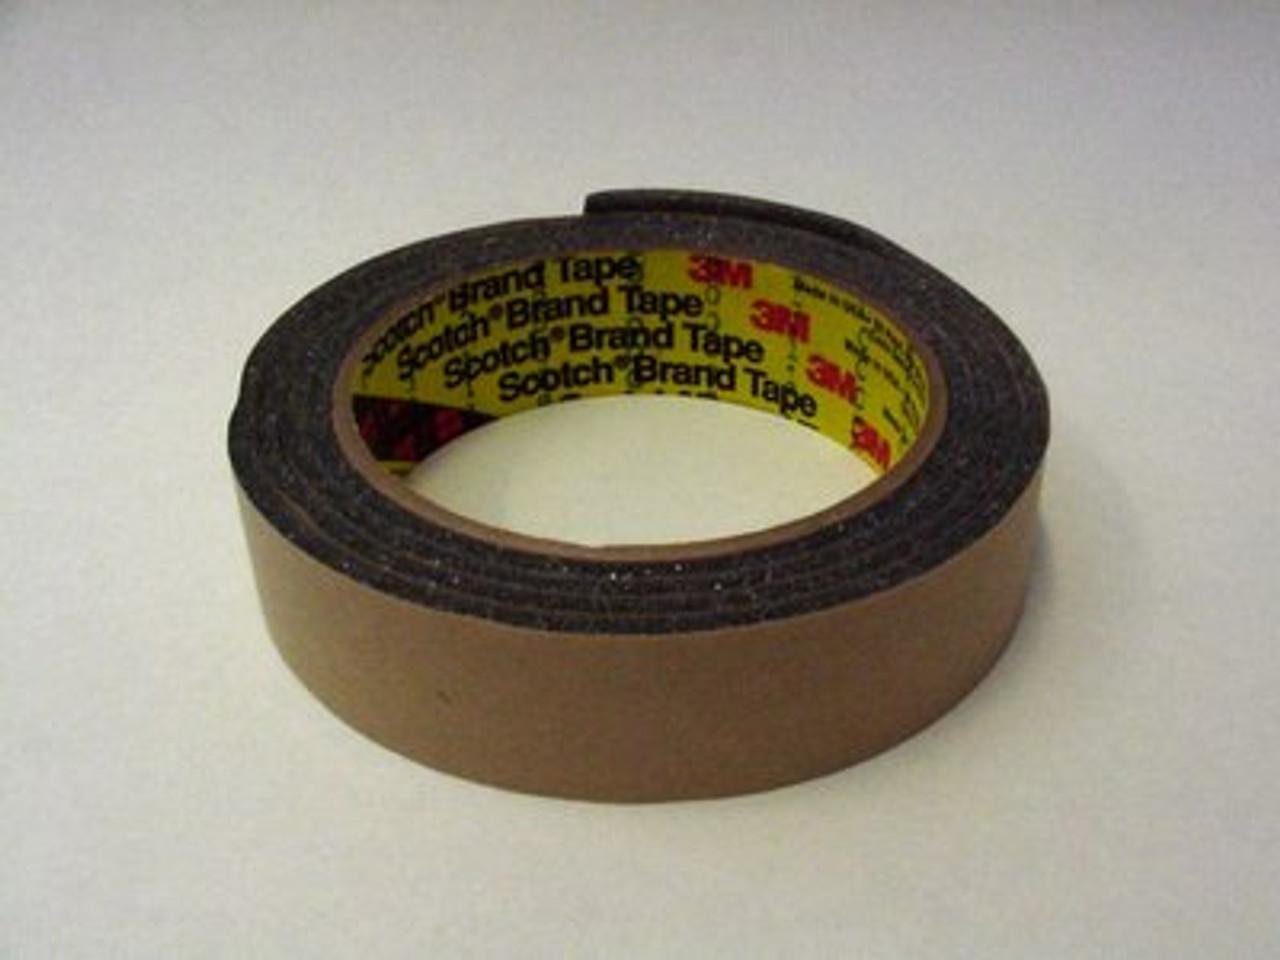 3M™ Urethane Foam Tape 4314 Charcoal Gray, 1/4 in x 18 yd 250.0 mil